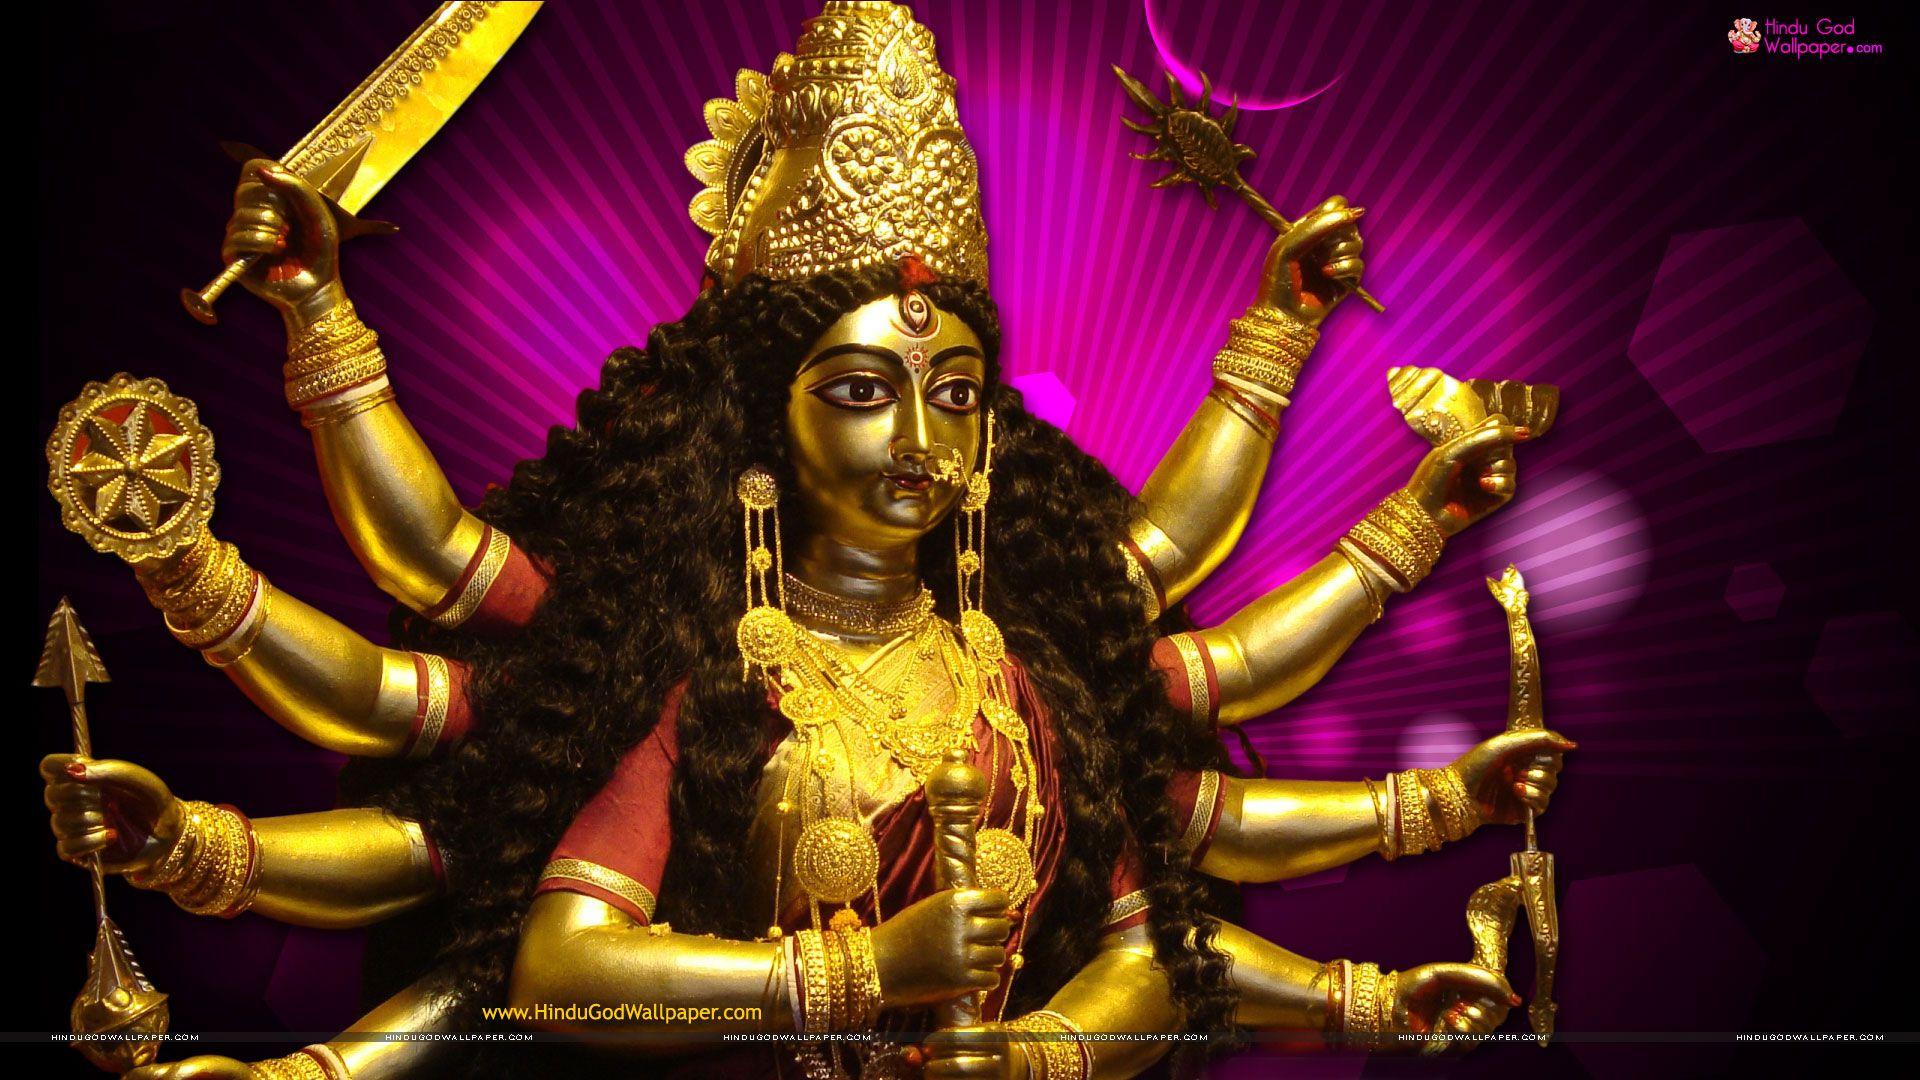 Goddess Durga Wallpapers High Quality Free Download Durga Durga